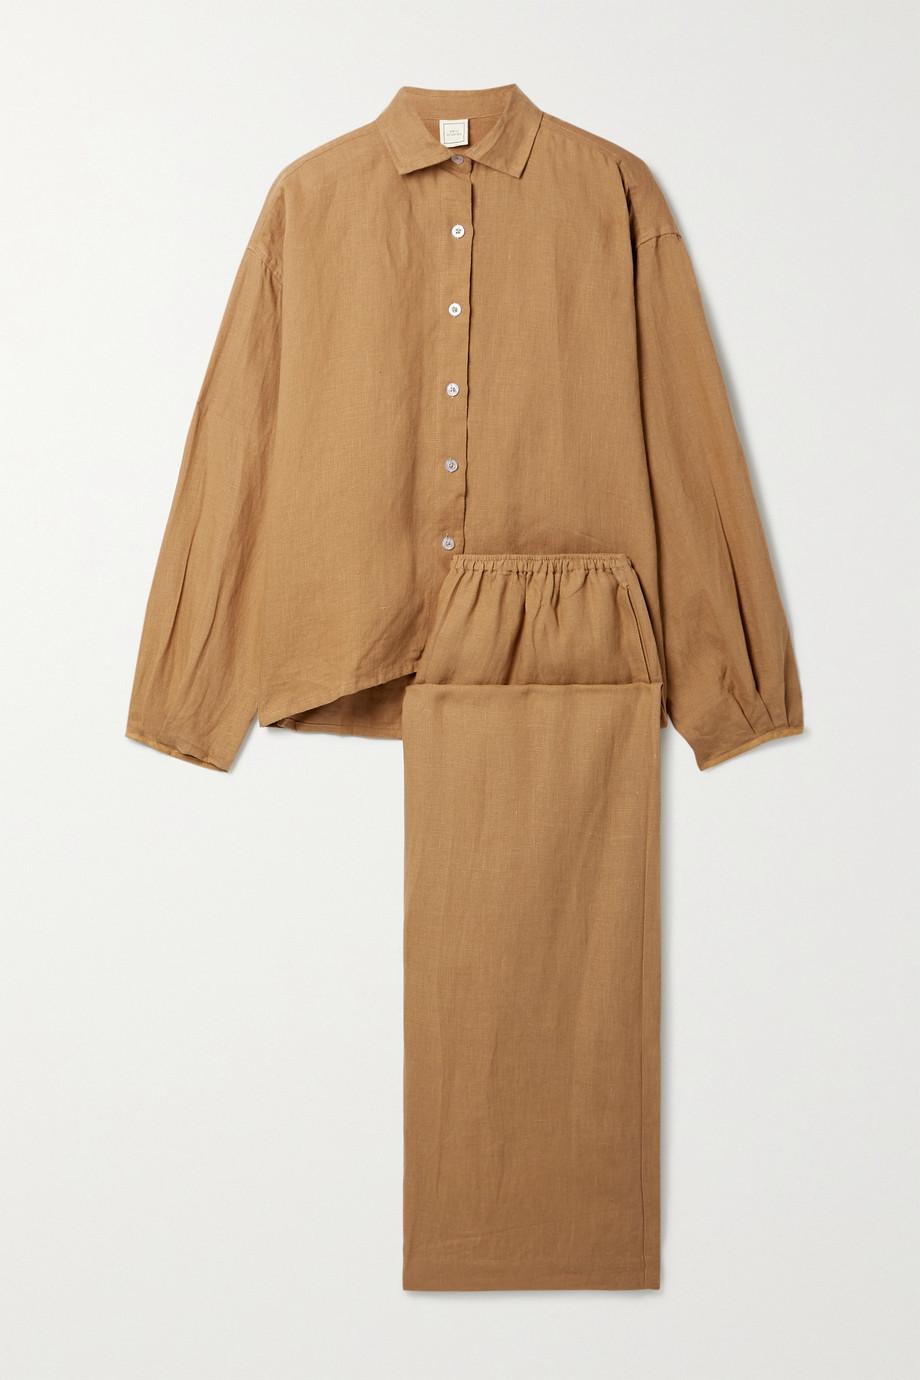 Deiji Studios + NET SUSTAIN linen shirt and wide-leg pants set